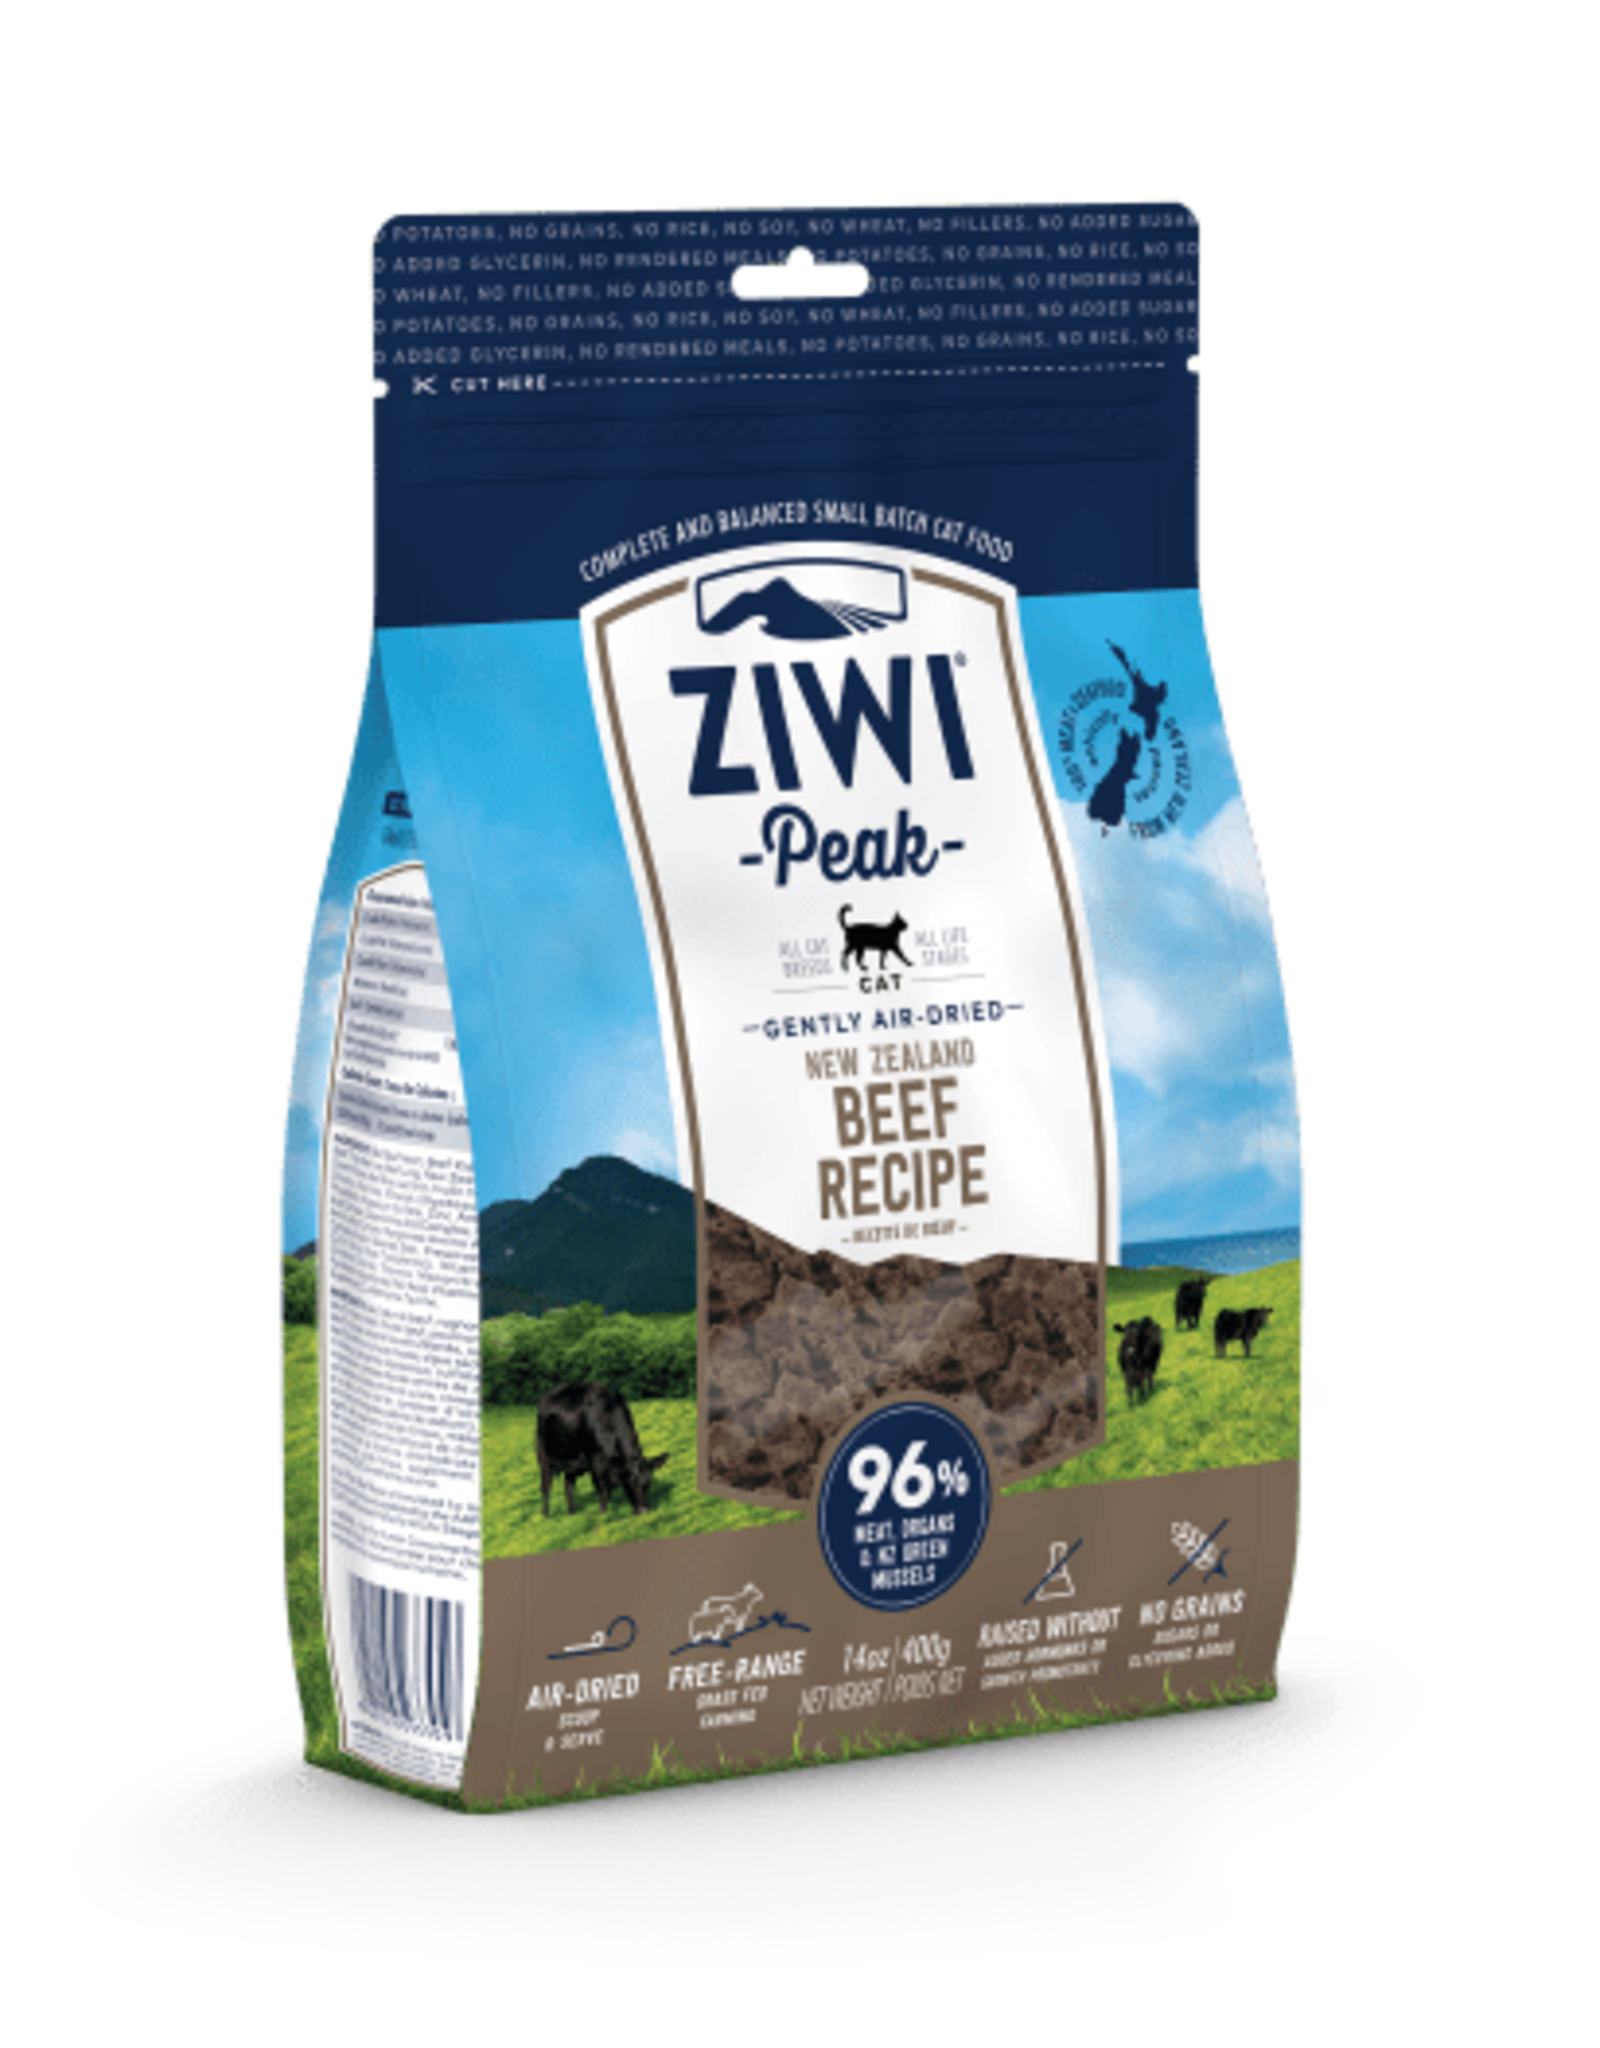 Ziwi Ziwi Peak - Cat Food - Beef Flavored - 14oz